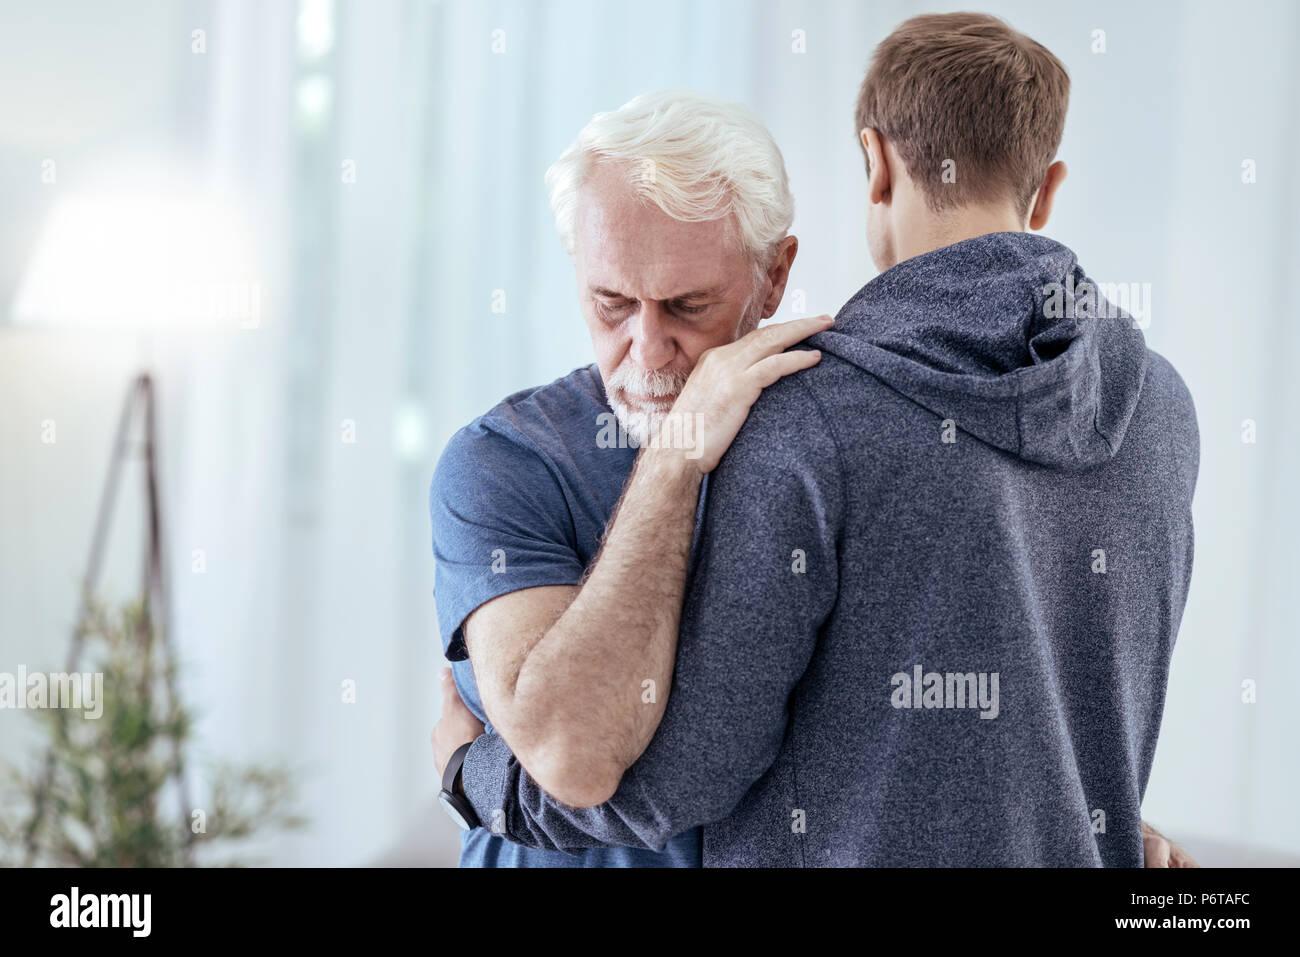 Young man encouraging senior man - Stock Image